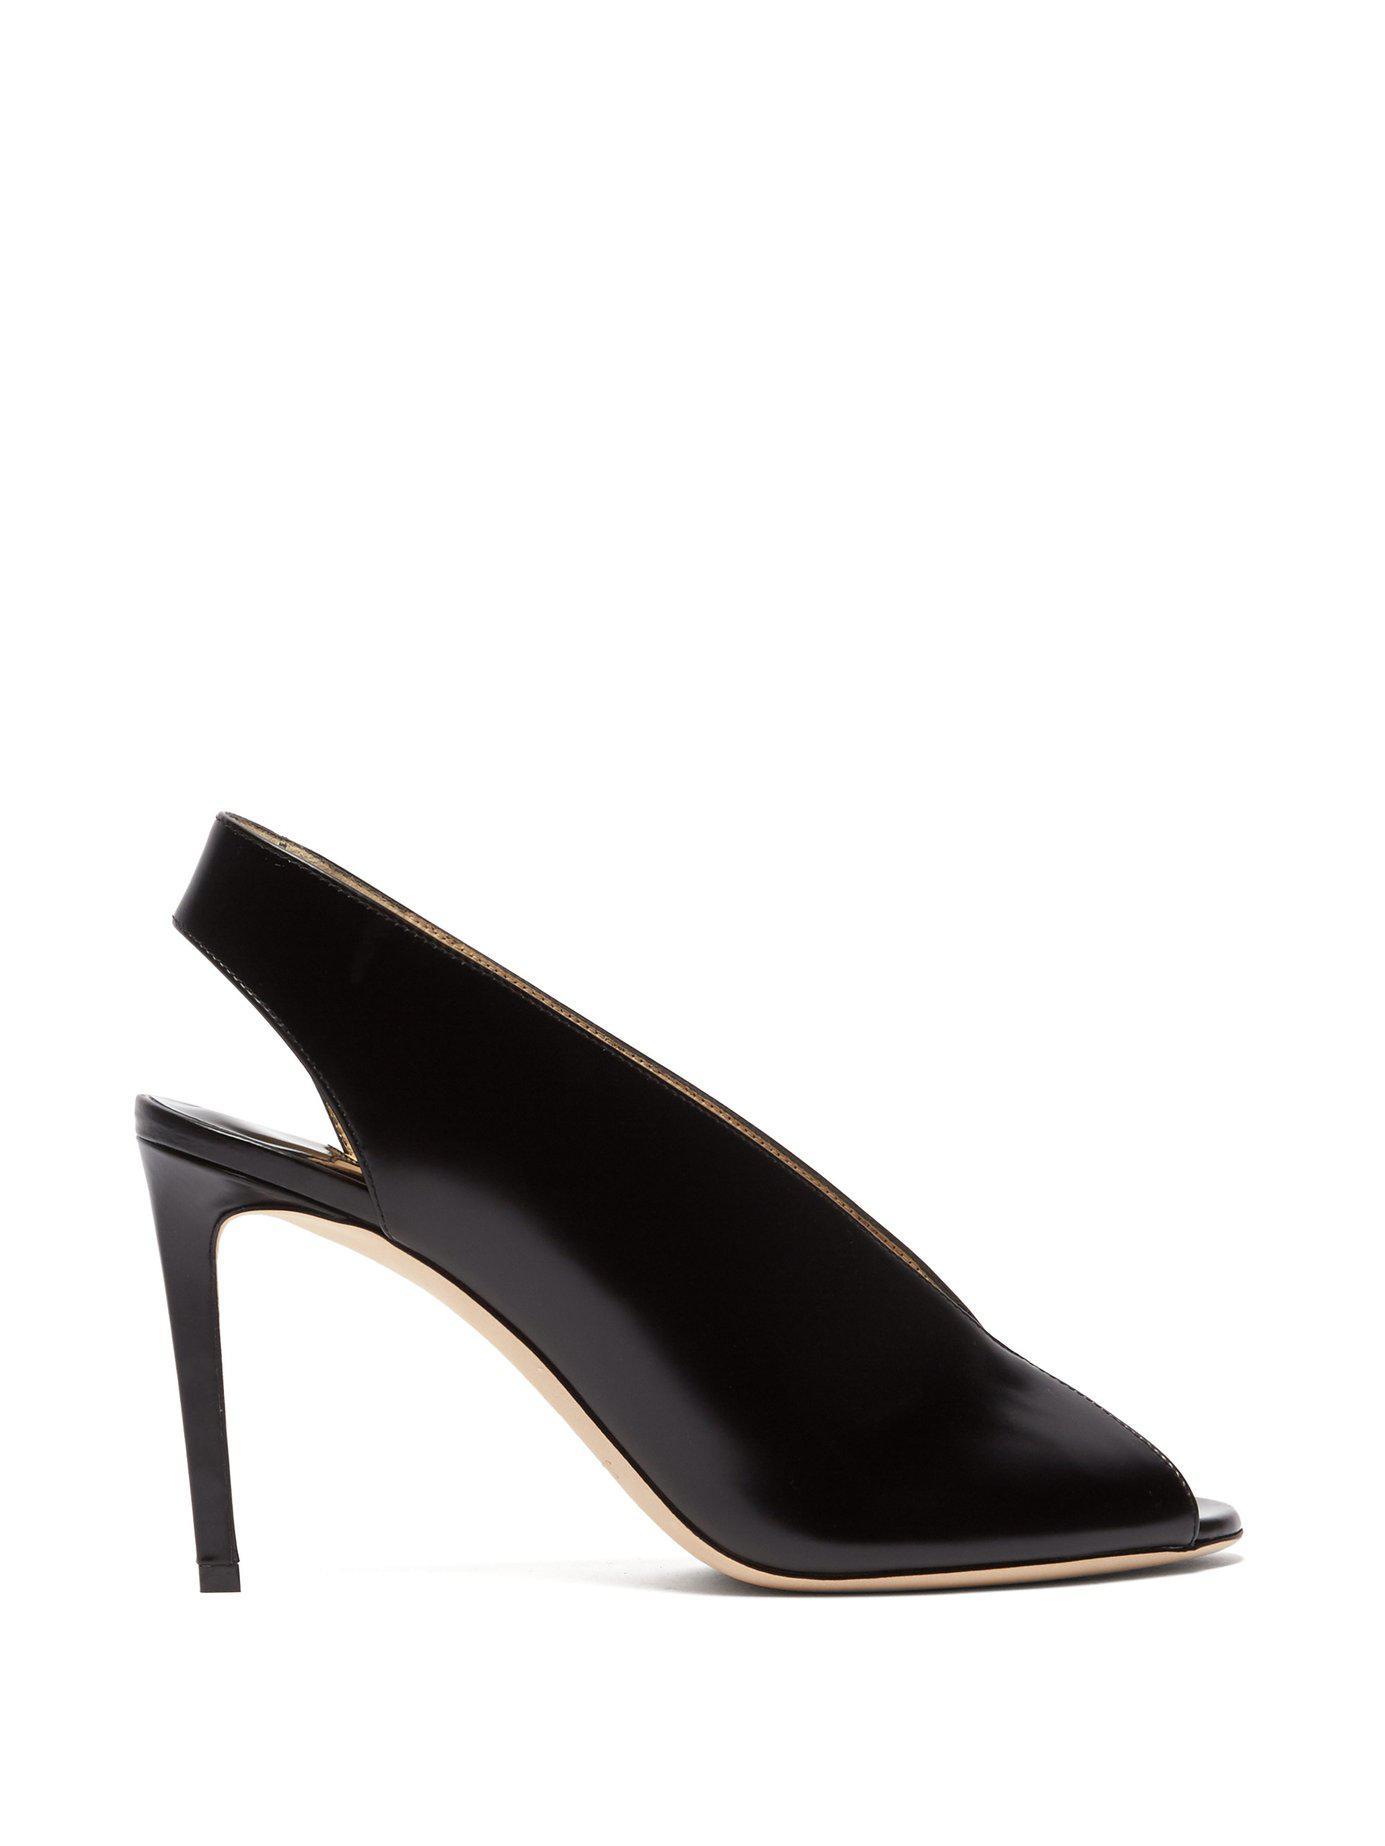 3b4745b8d1af Lyst - Jimmy Choo Shar 85 Slingback Leather Sandals in Black